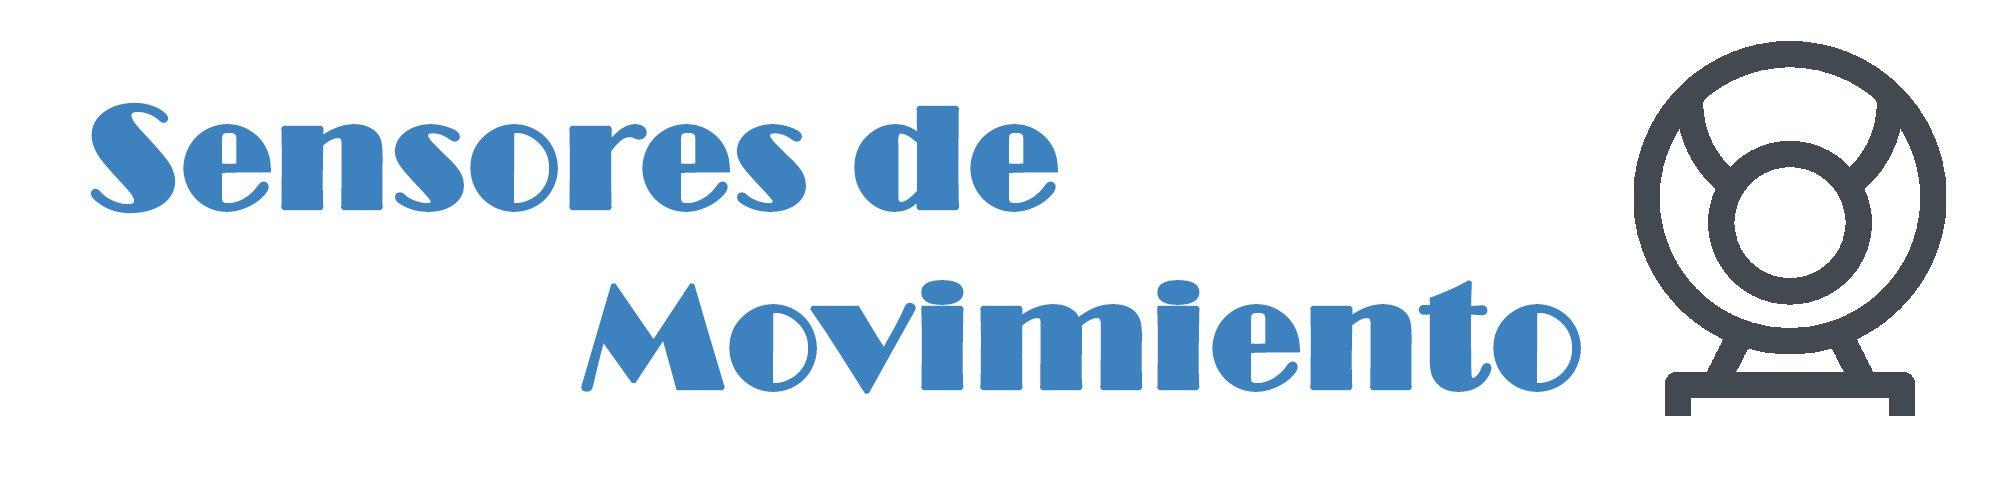 logo sensoresdemovimiento.site